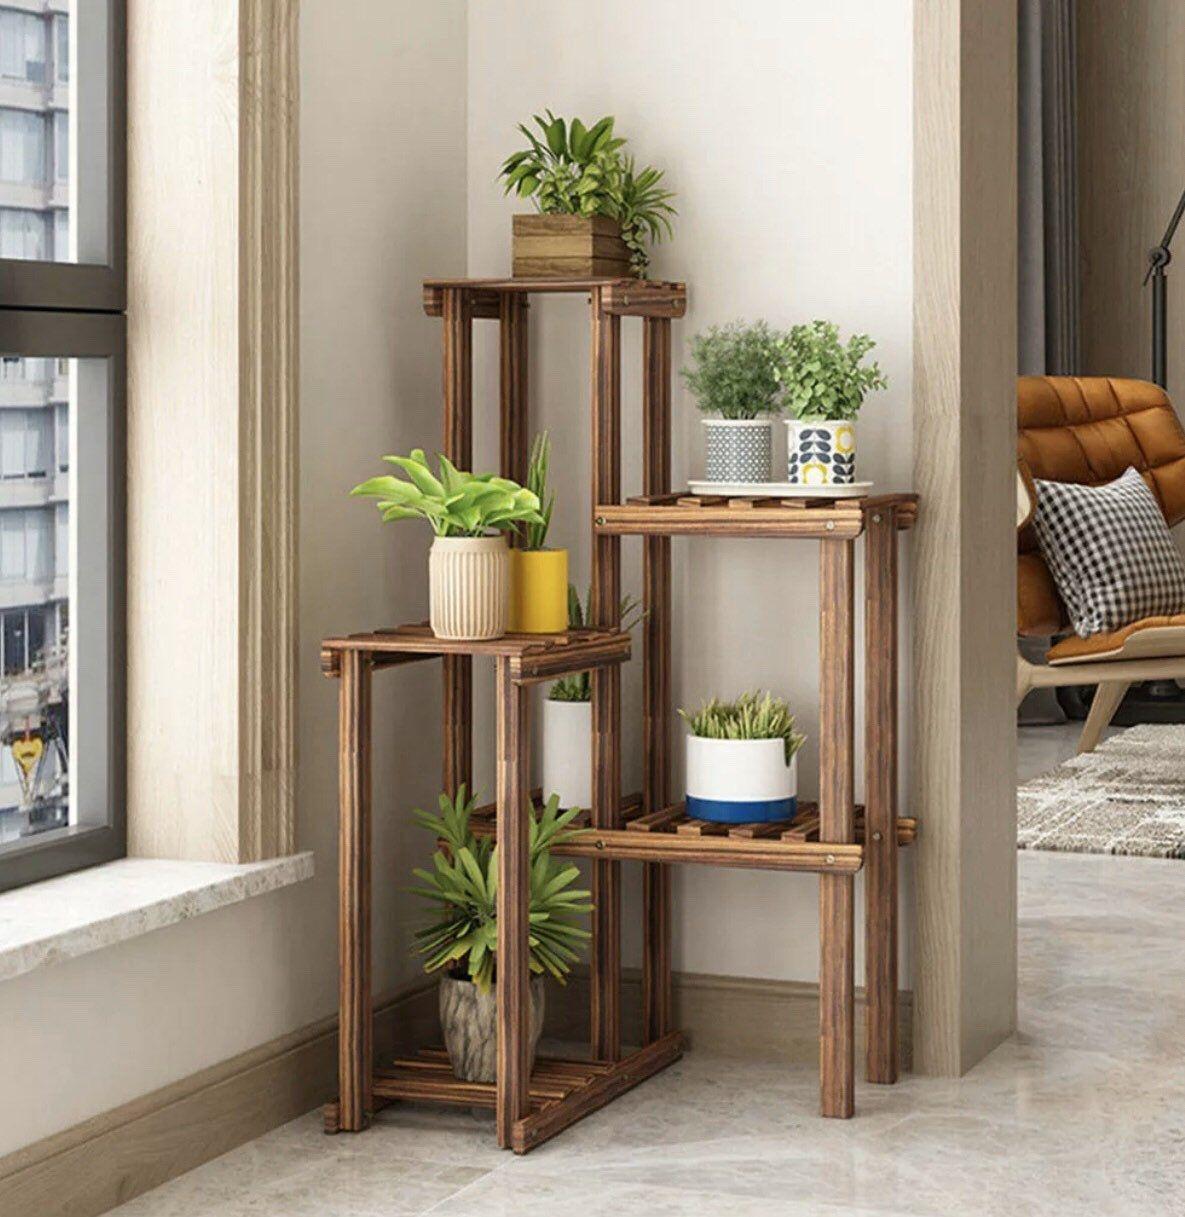 Wooden Corner Flower Plant Stands Indoor Flower Stand Rack Shelf